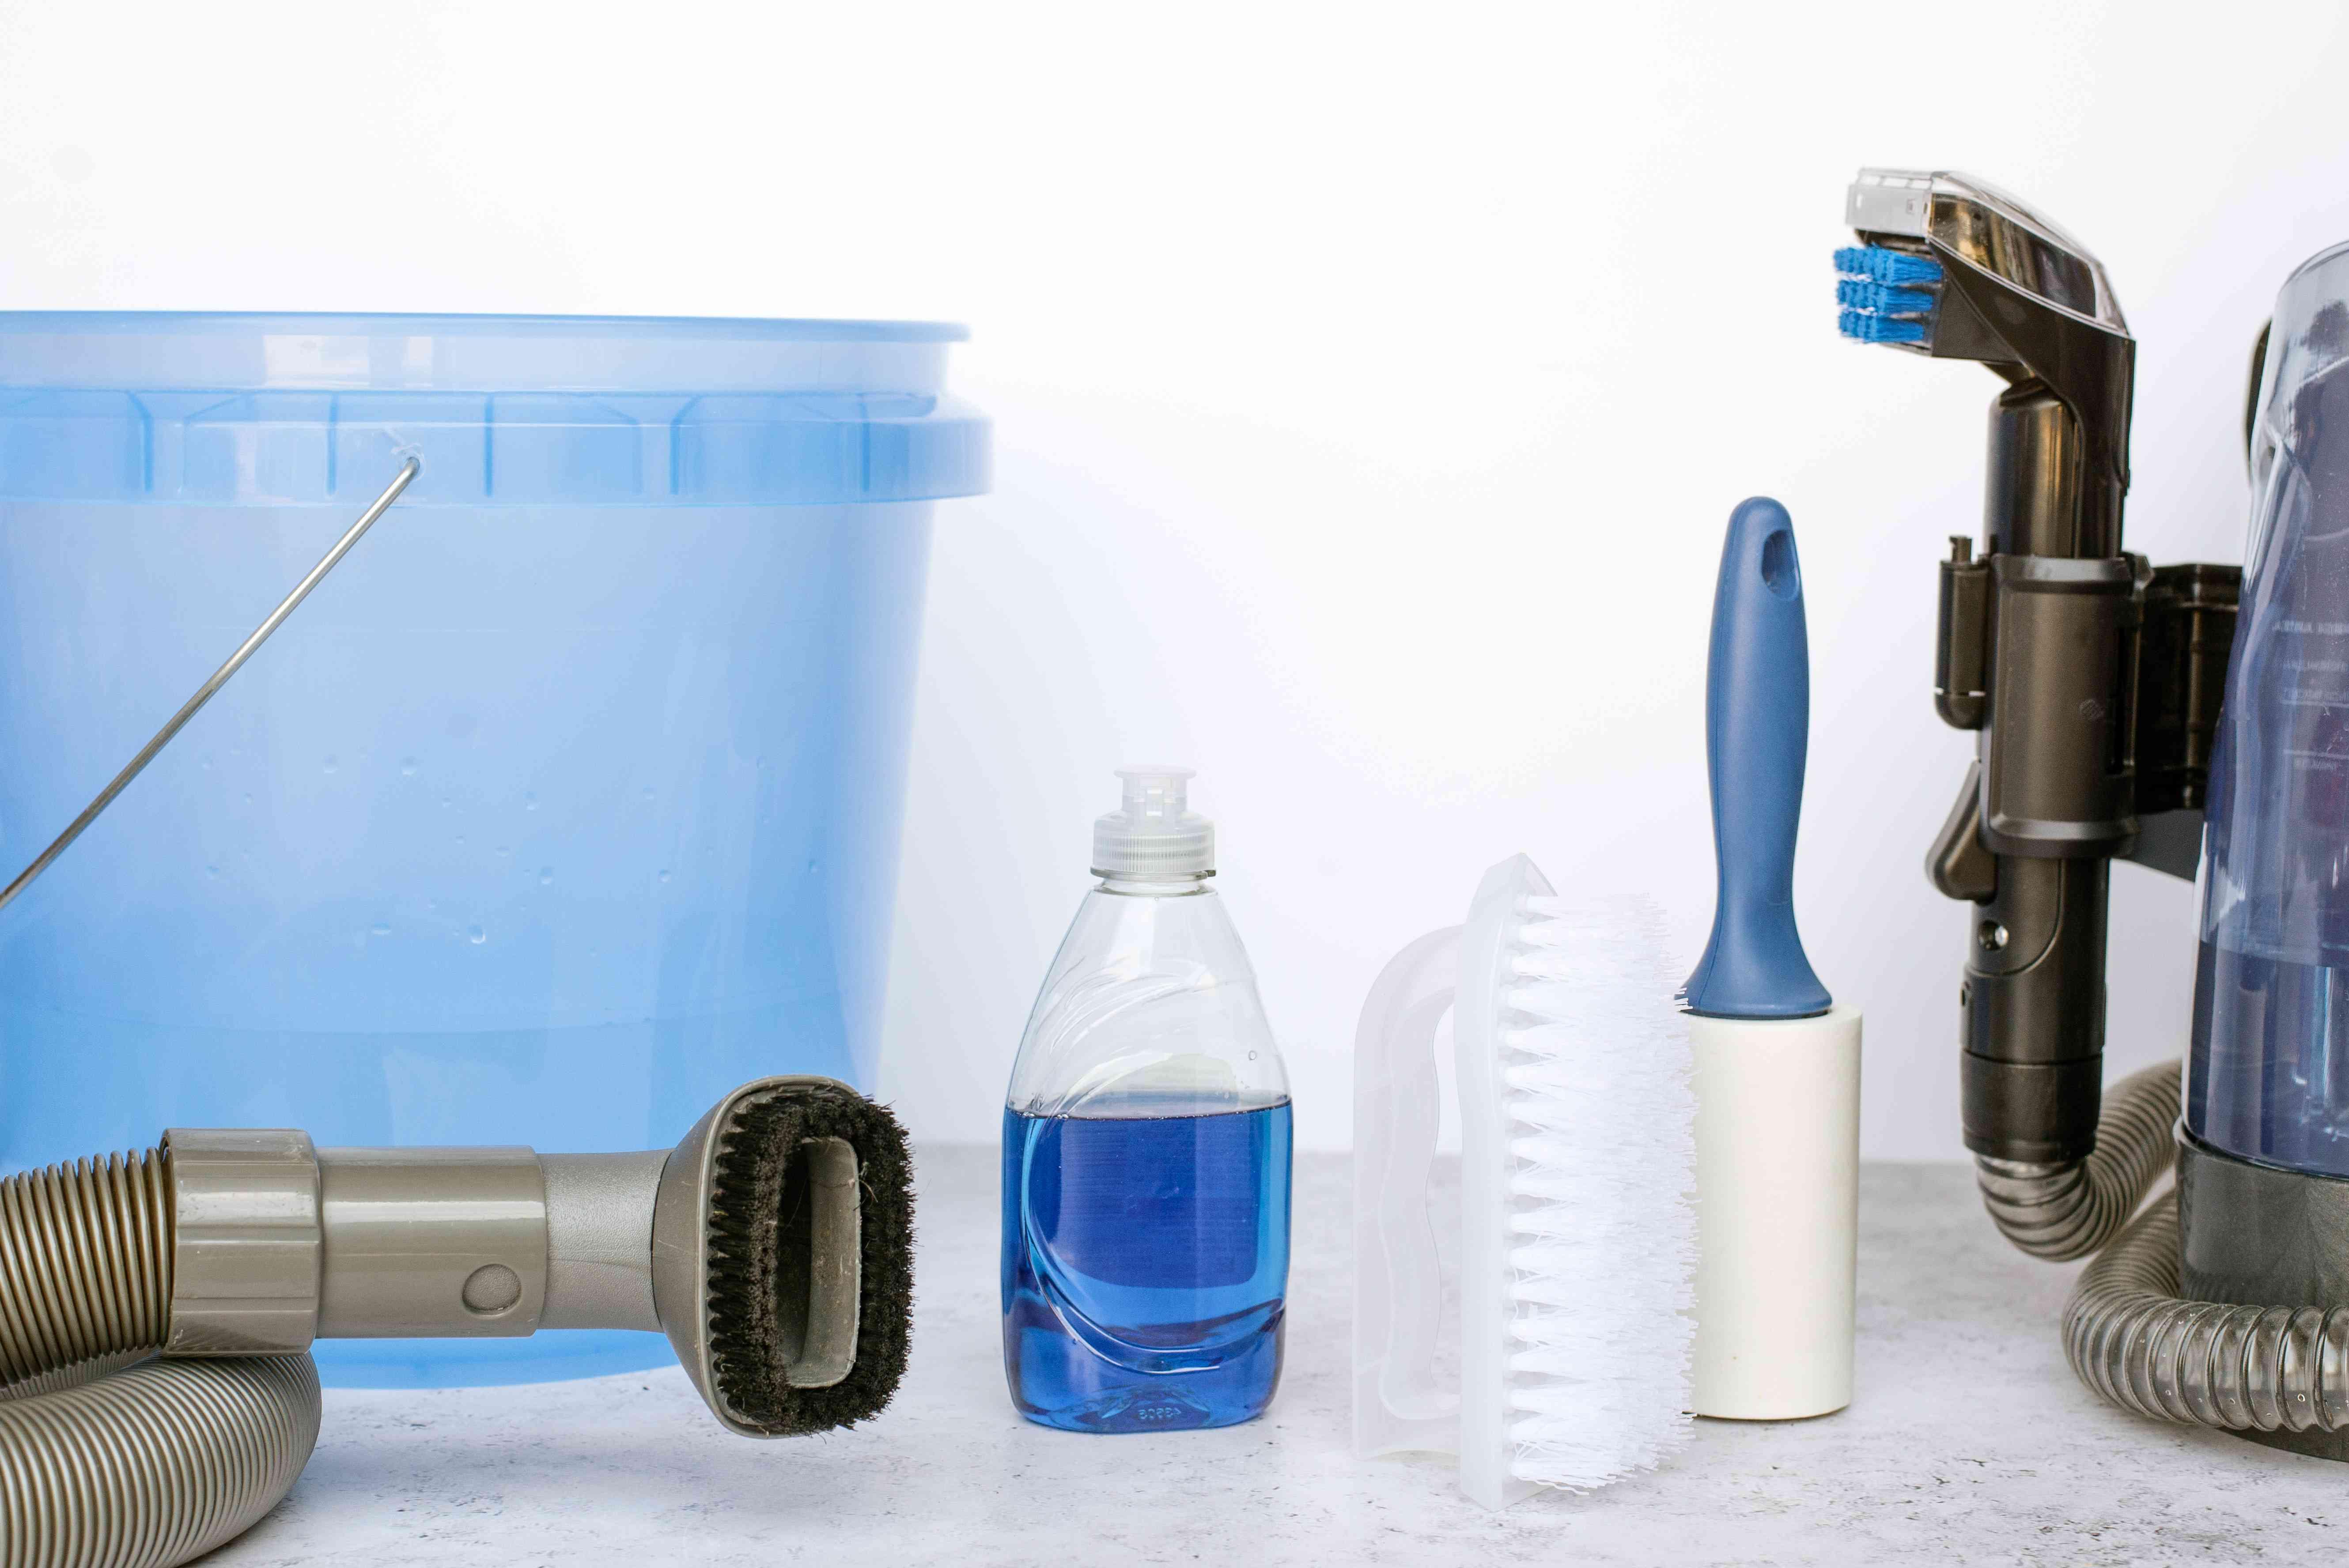 Materials and tools to clean car mats